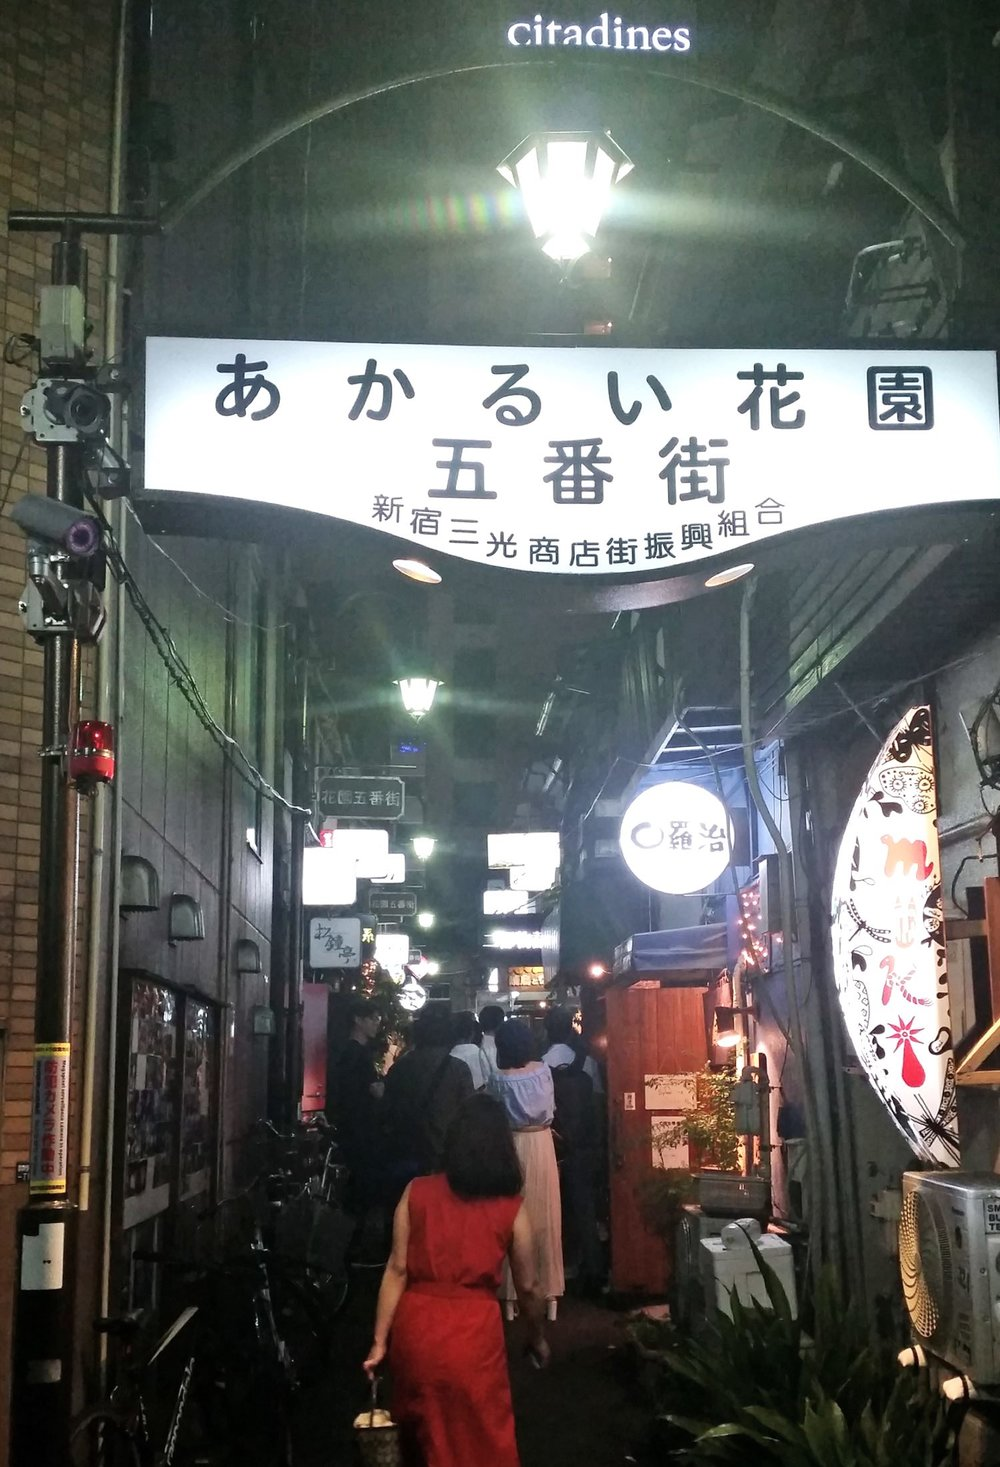 tokyo-japan-character-32-c32-asia-travel-golden-gai